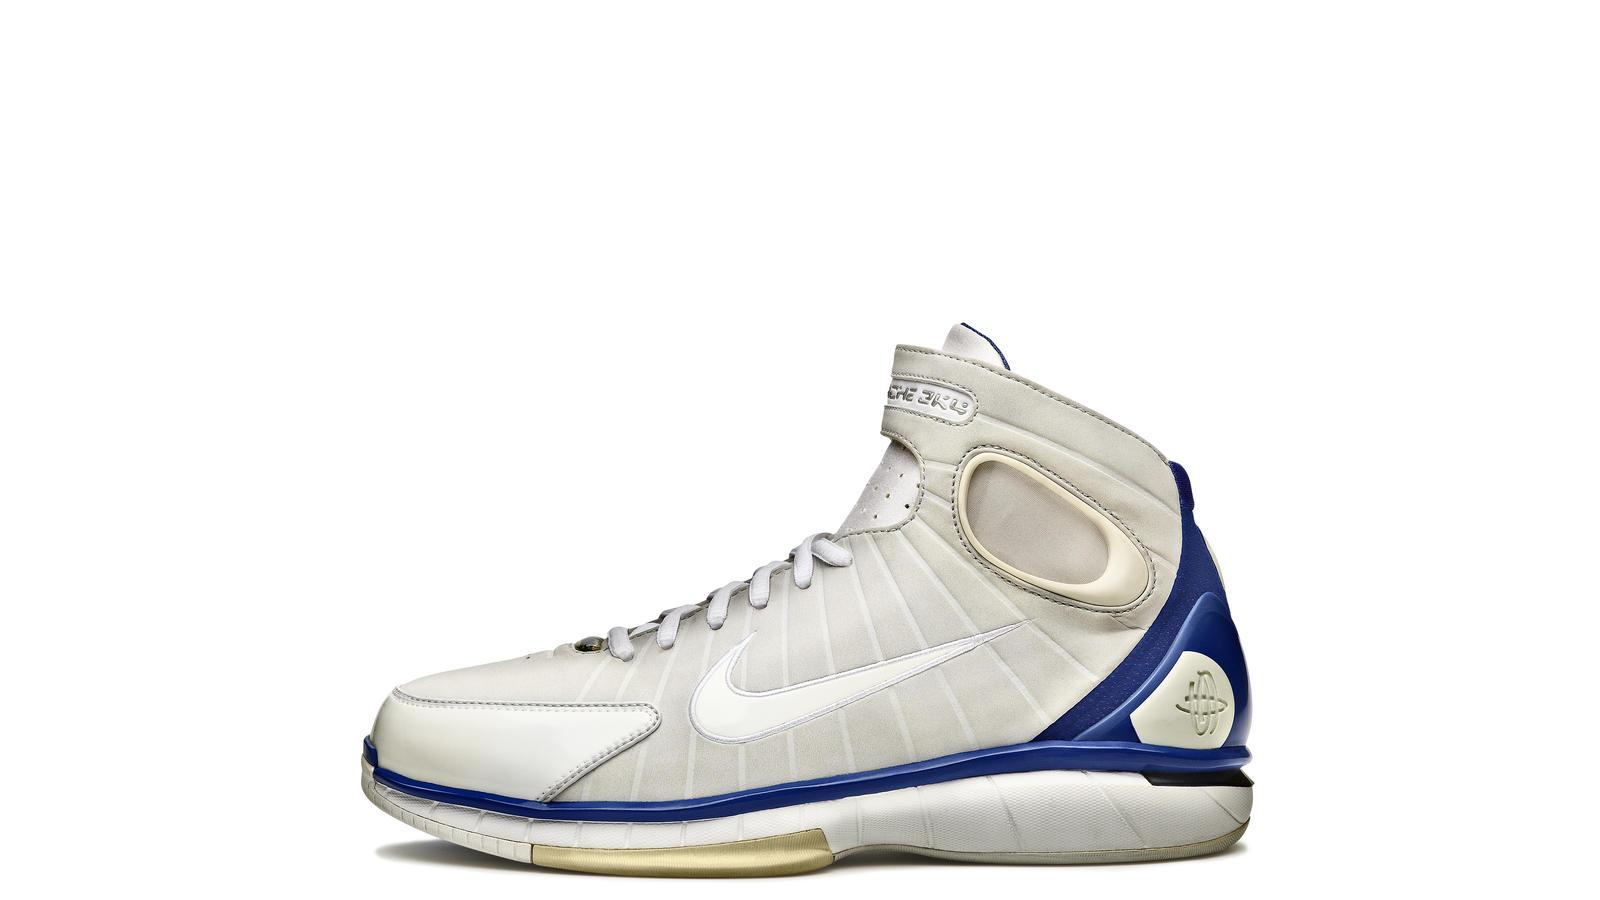 nike zoom huarache basketball shoes